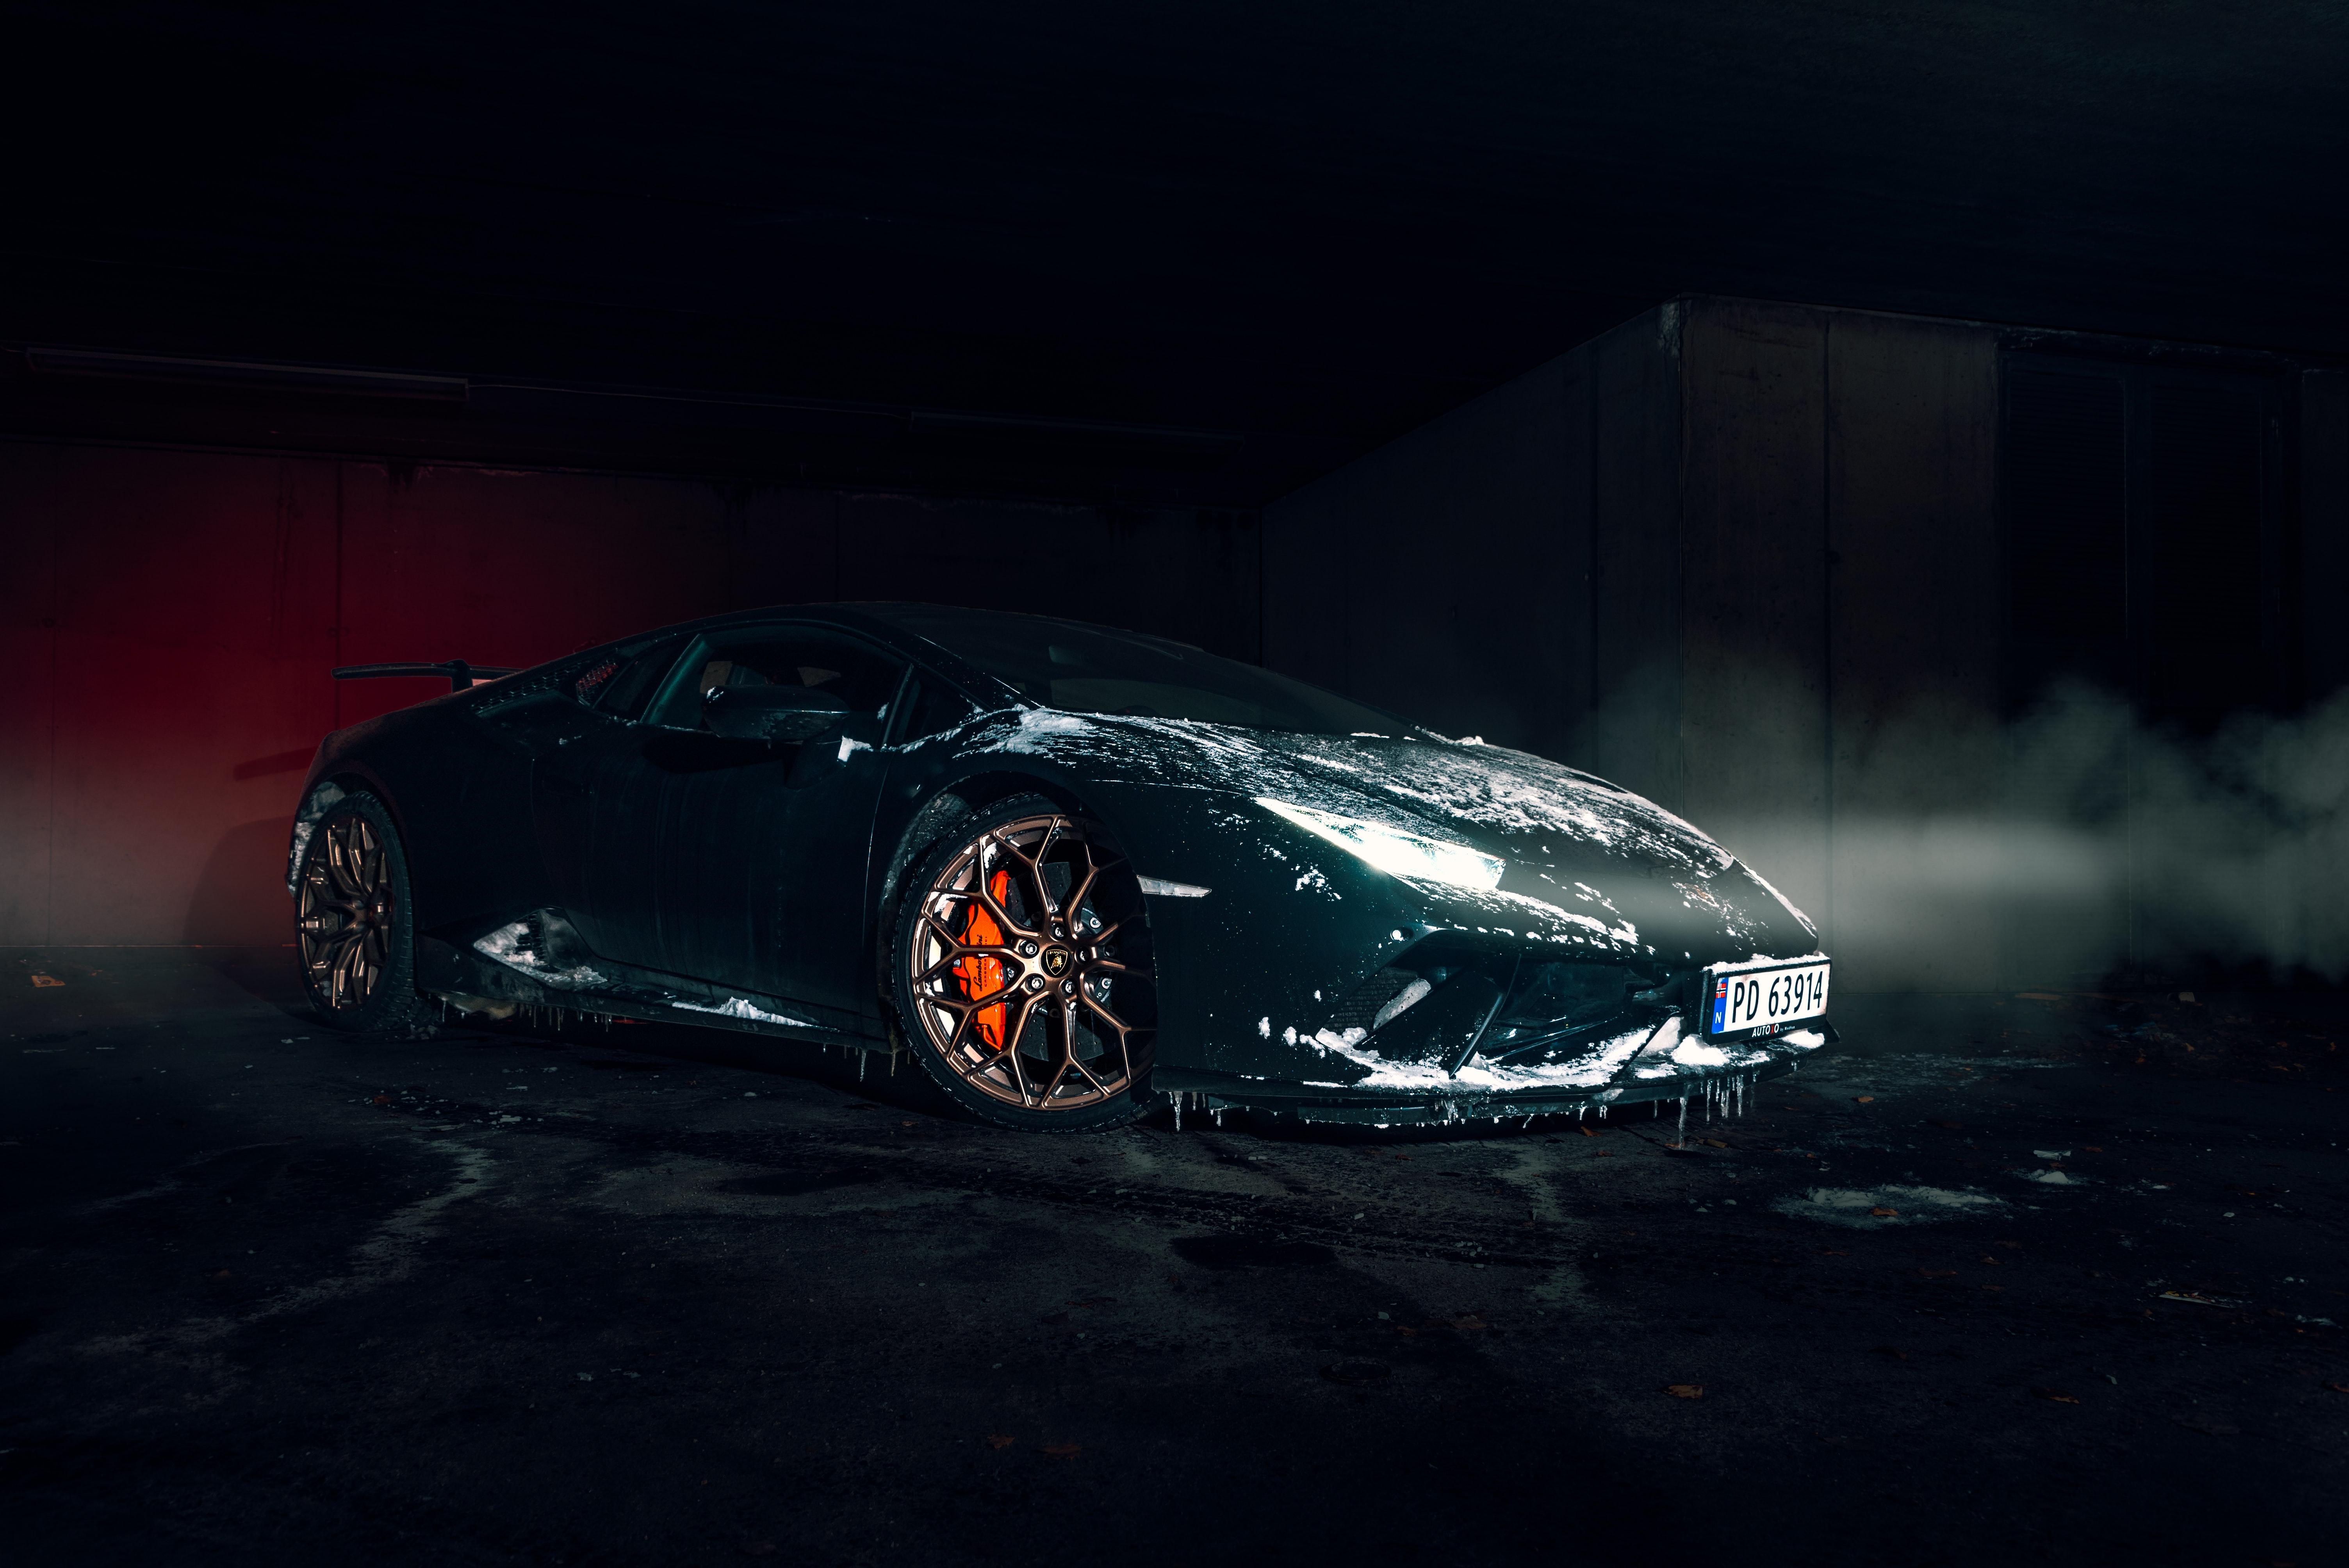 Lamborghini Wallpapers: Free HD